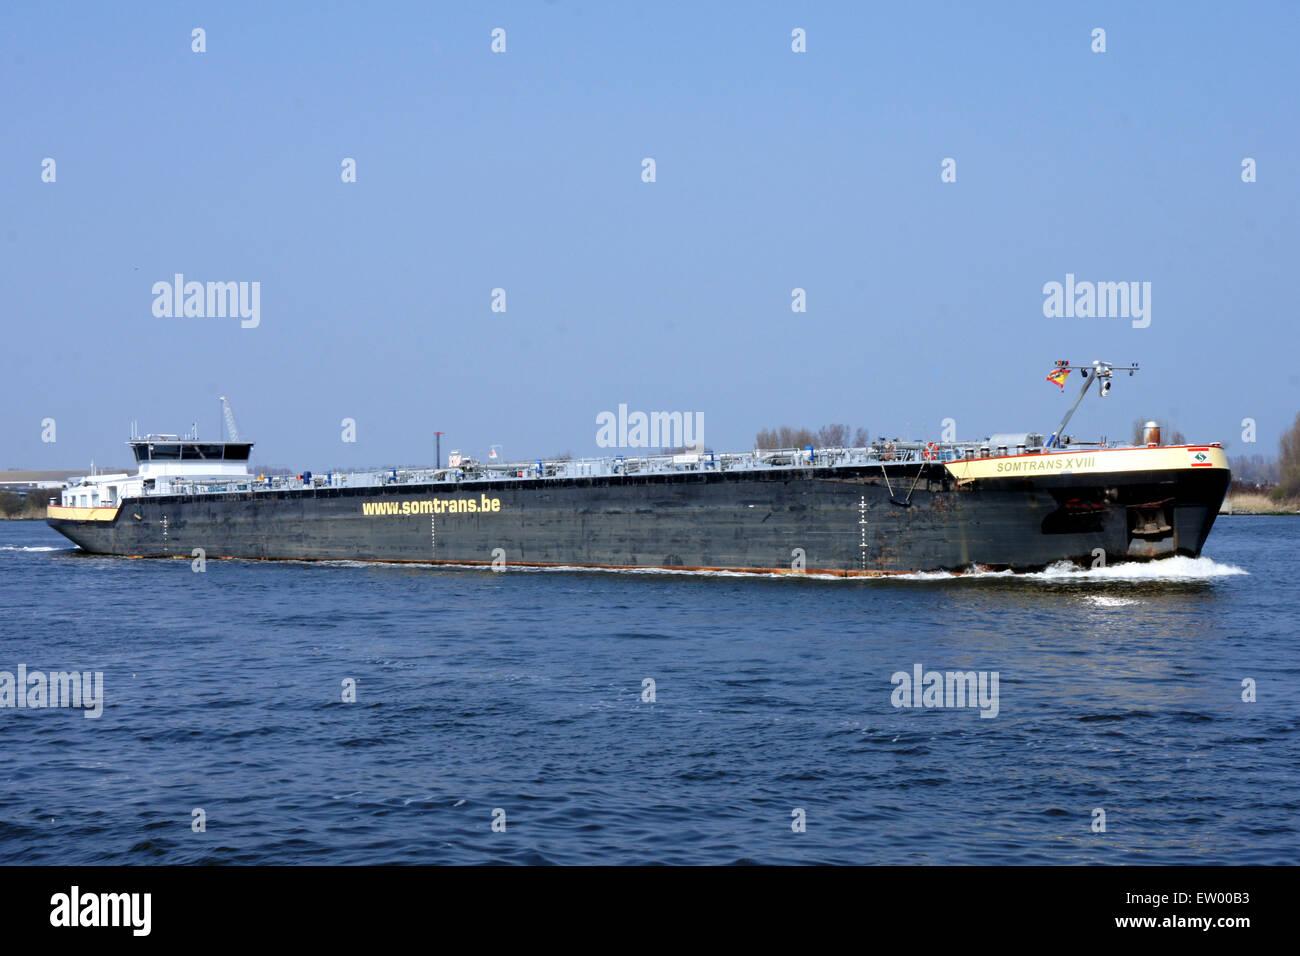 Somtrans XVIII - IMO 9372808 - ENI 02328172, Noordzeekanaal, Port of Amsterdam, pic3 Stock Photo